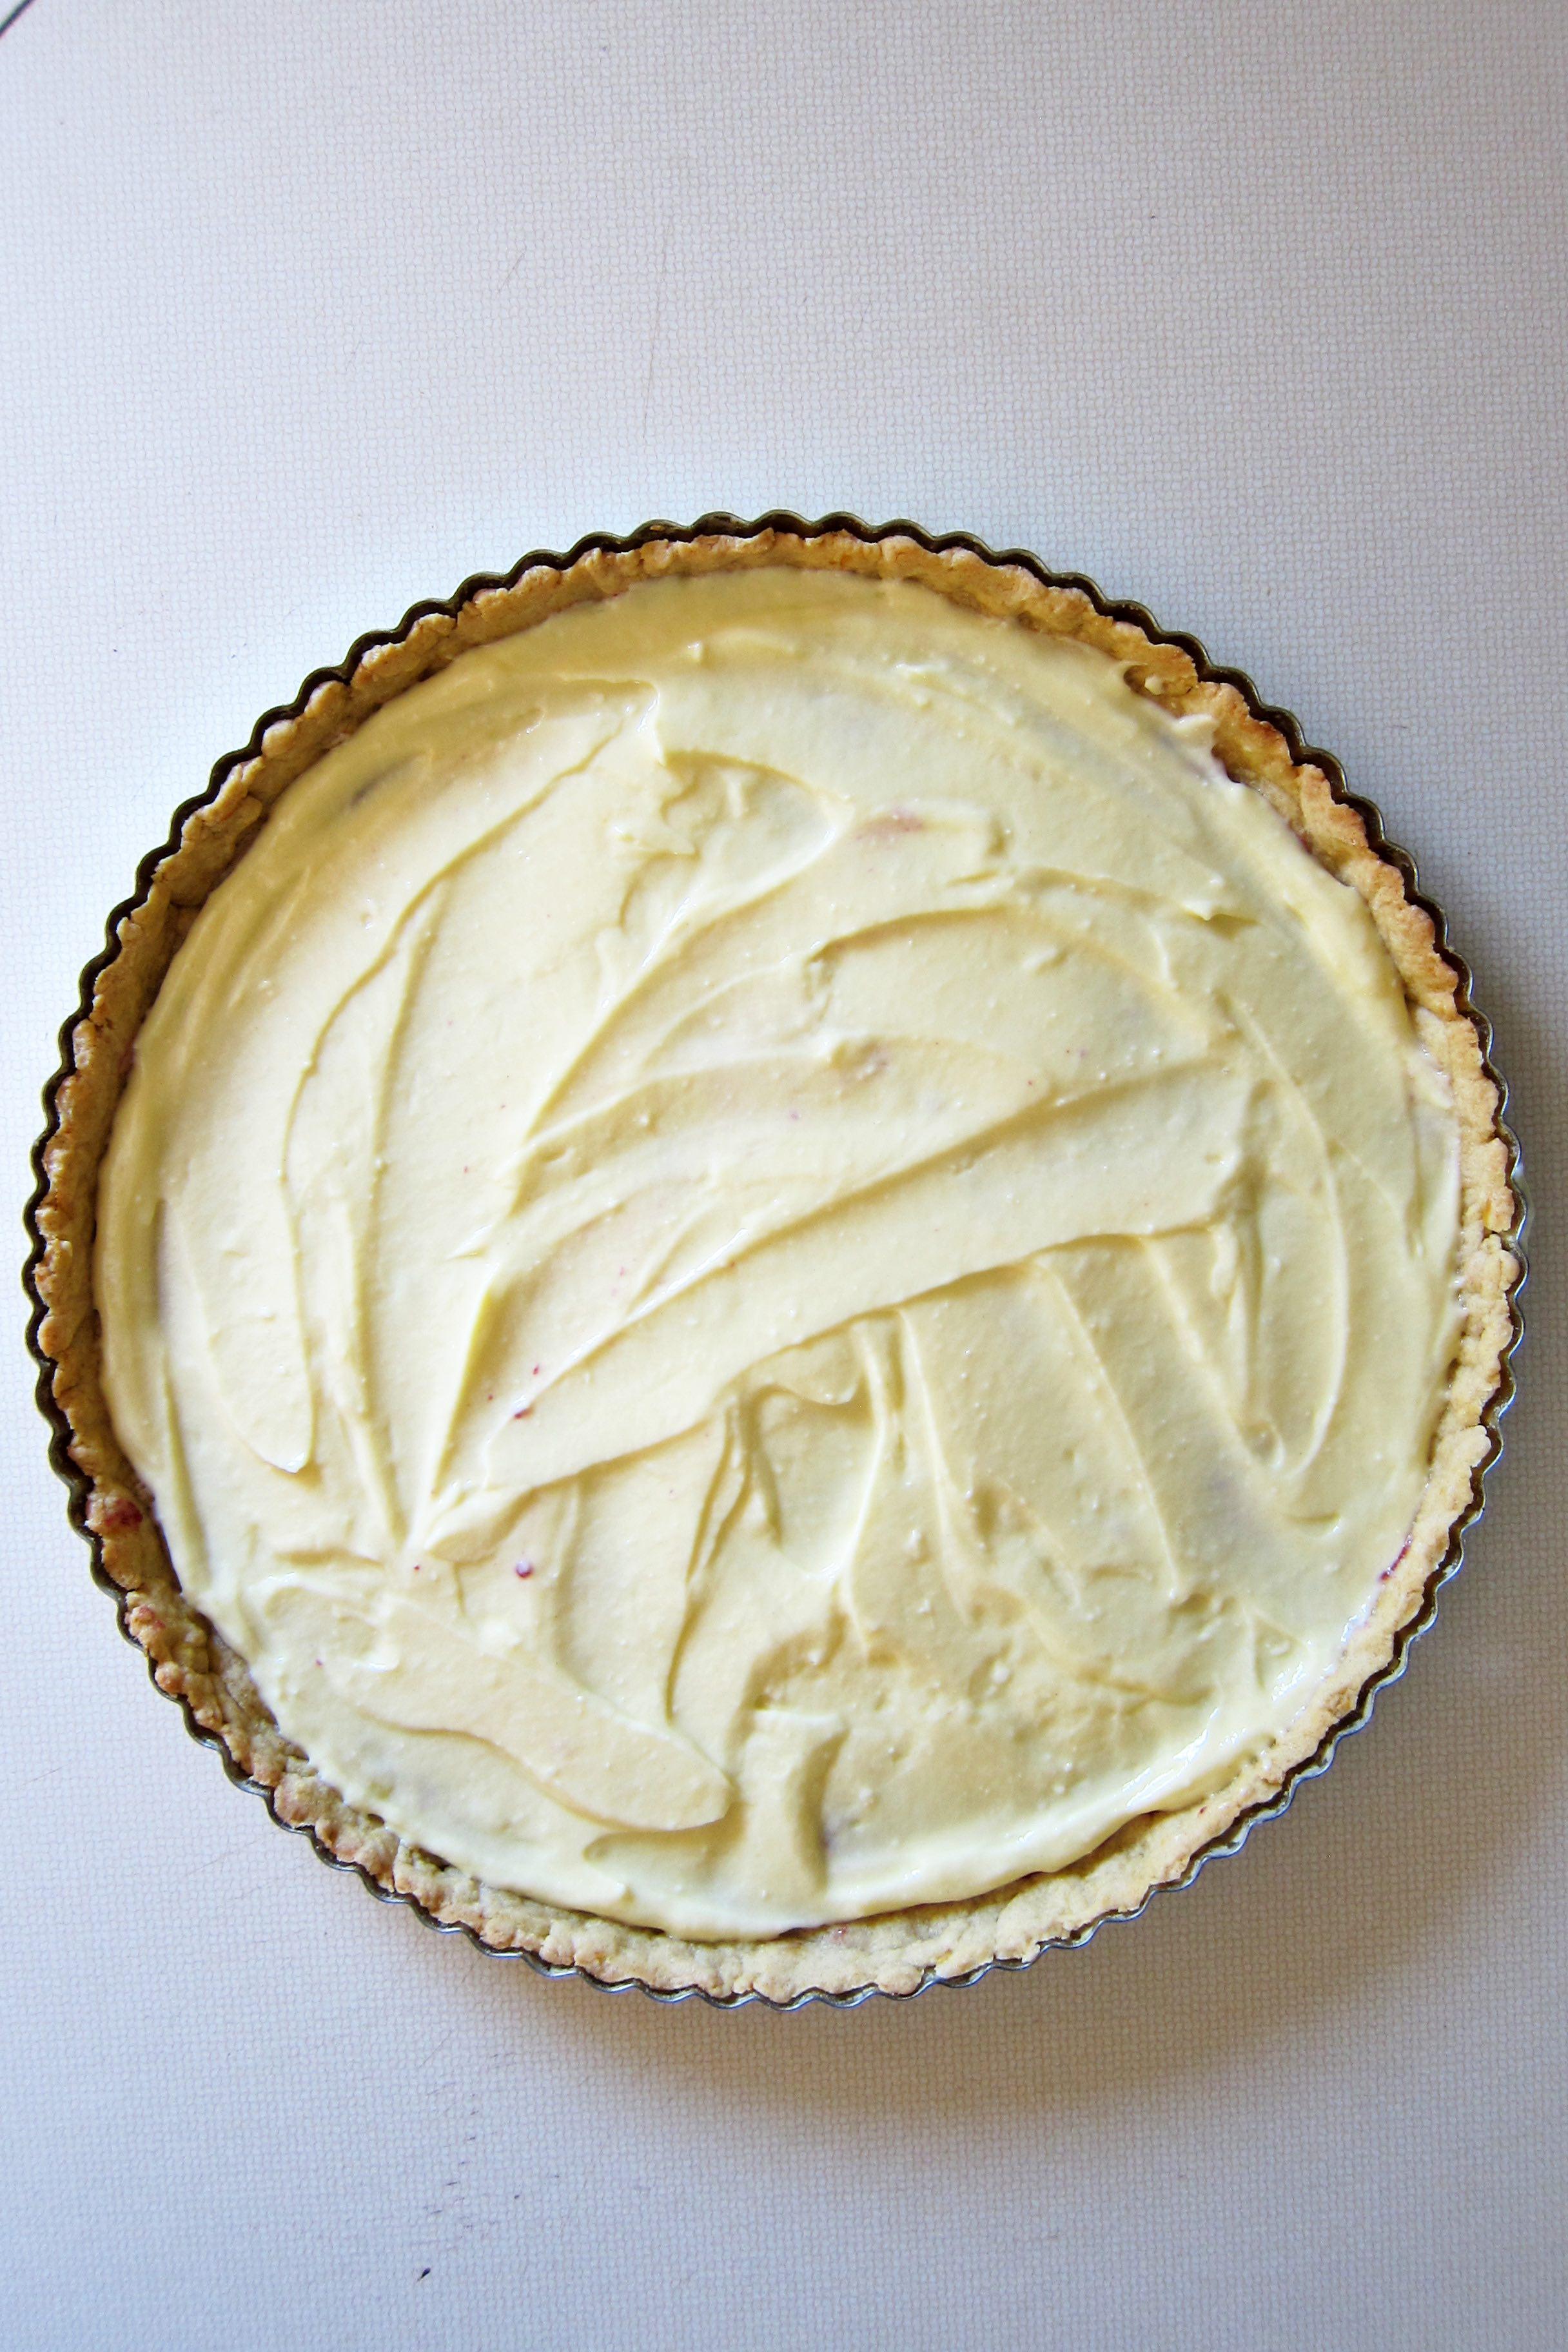 Accidental Cream Pie Ideal spelt tart | accidental artisan